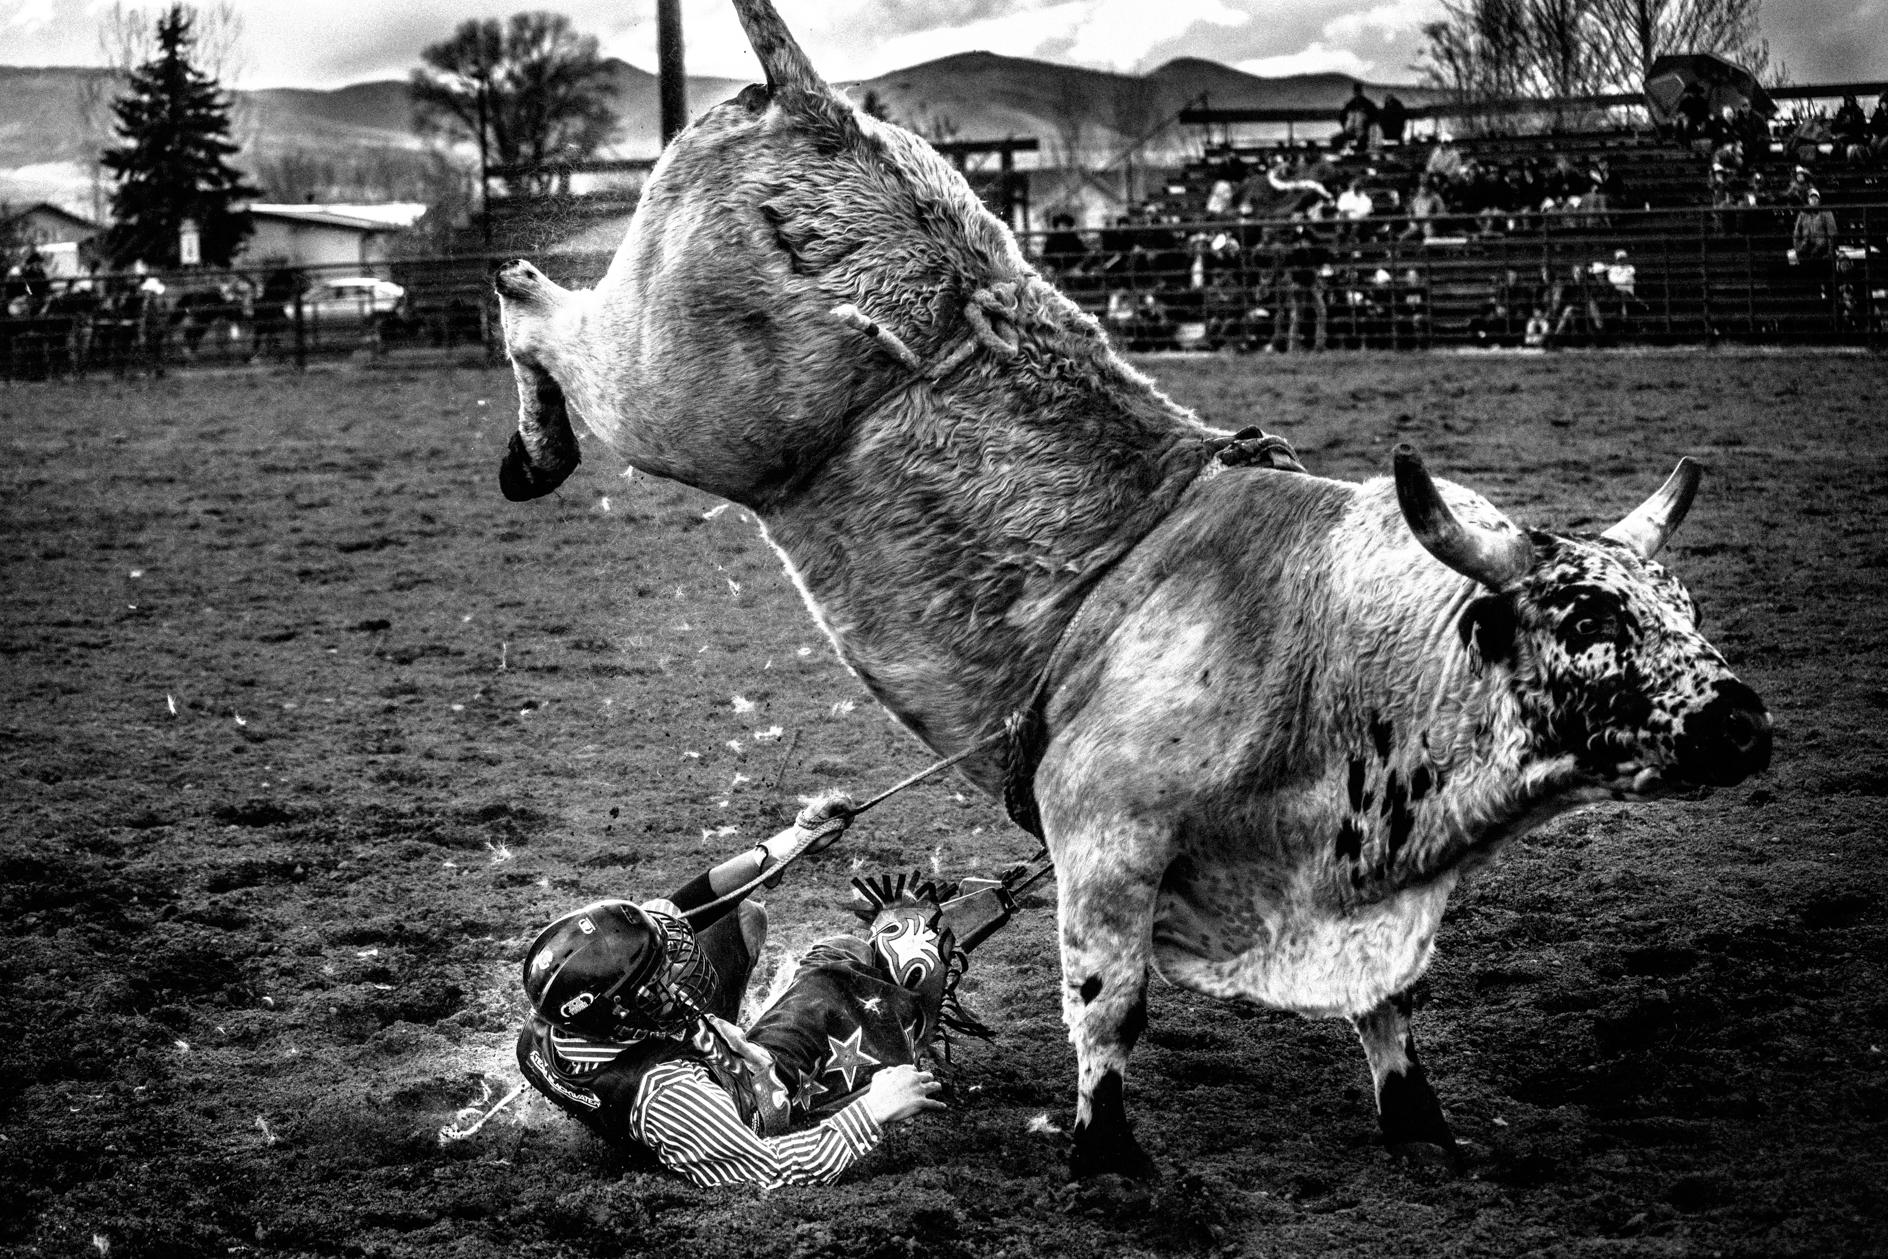 Montana-Junior-Rodeo-Bozeman-Photographer-12.JPG